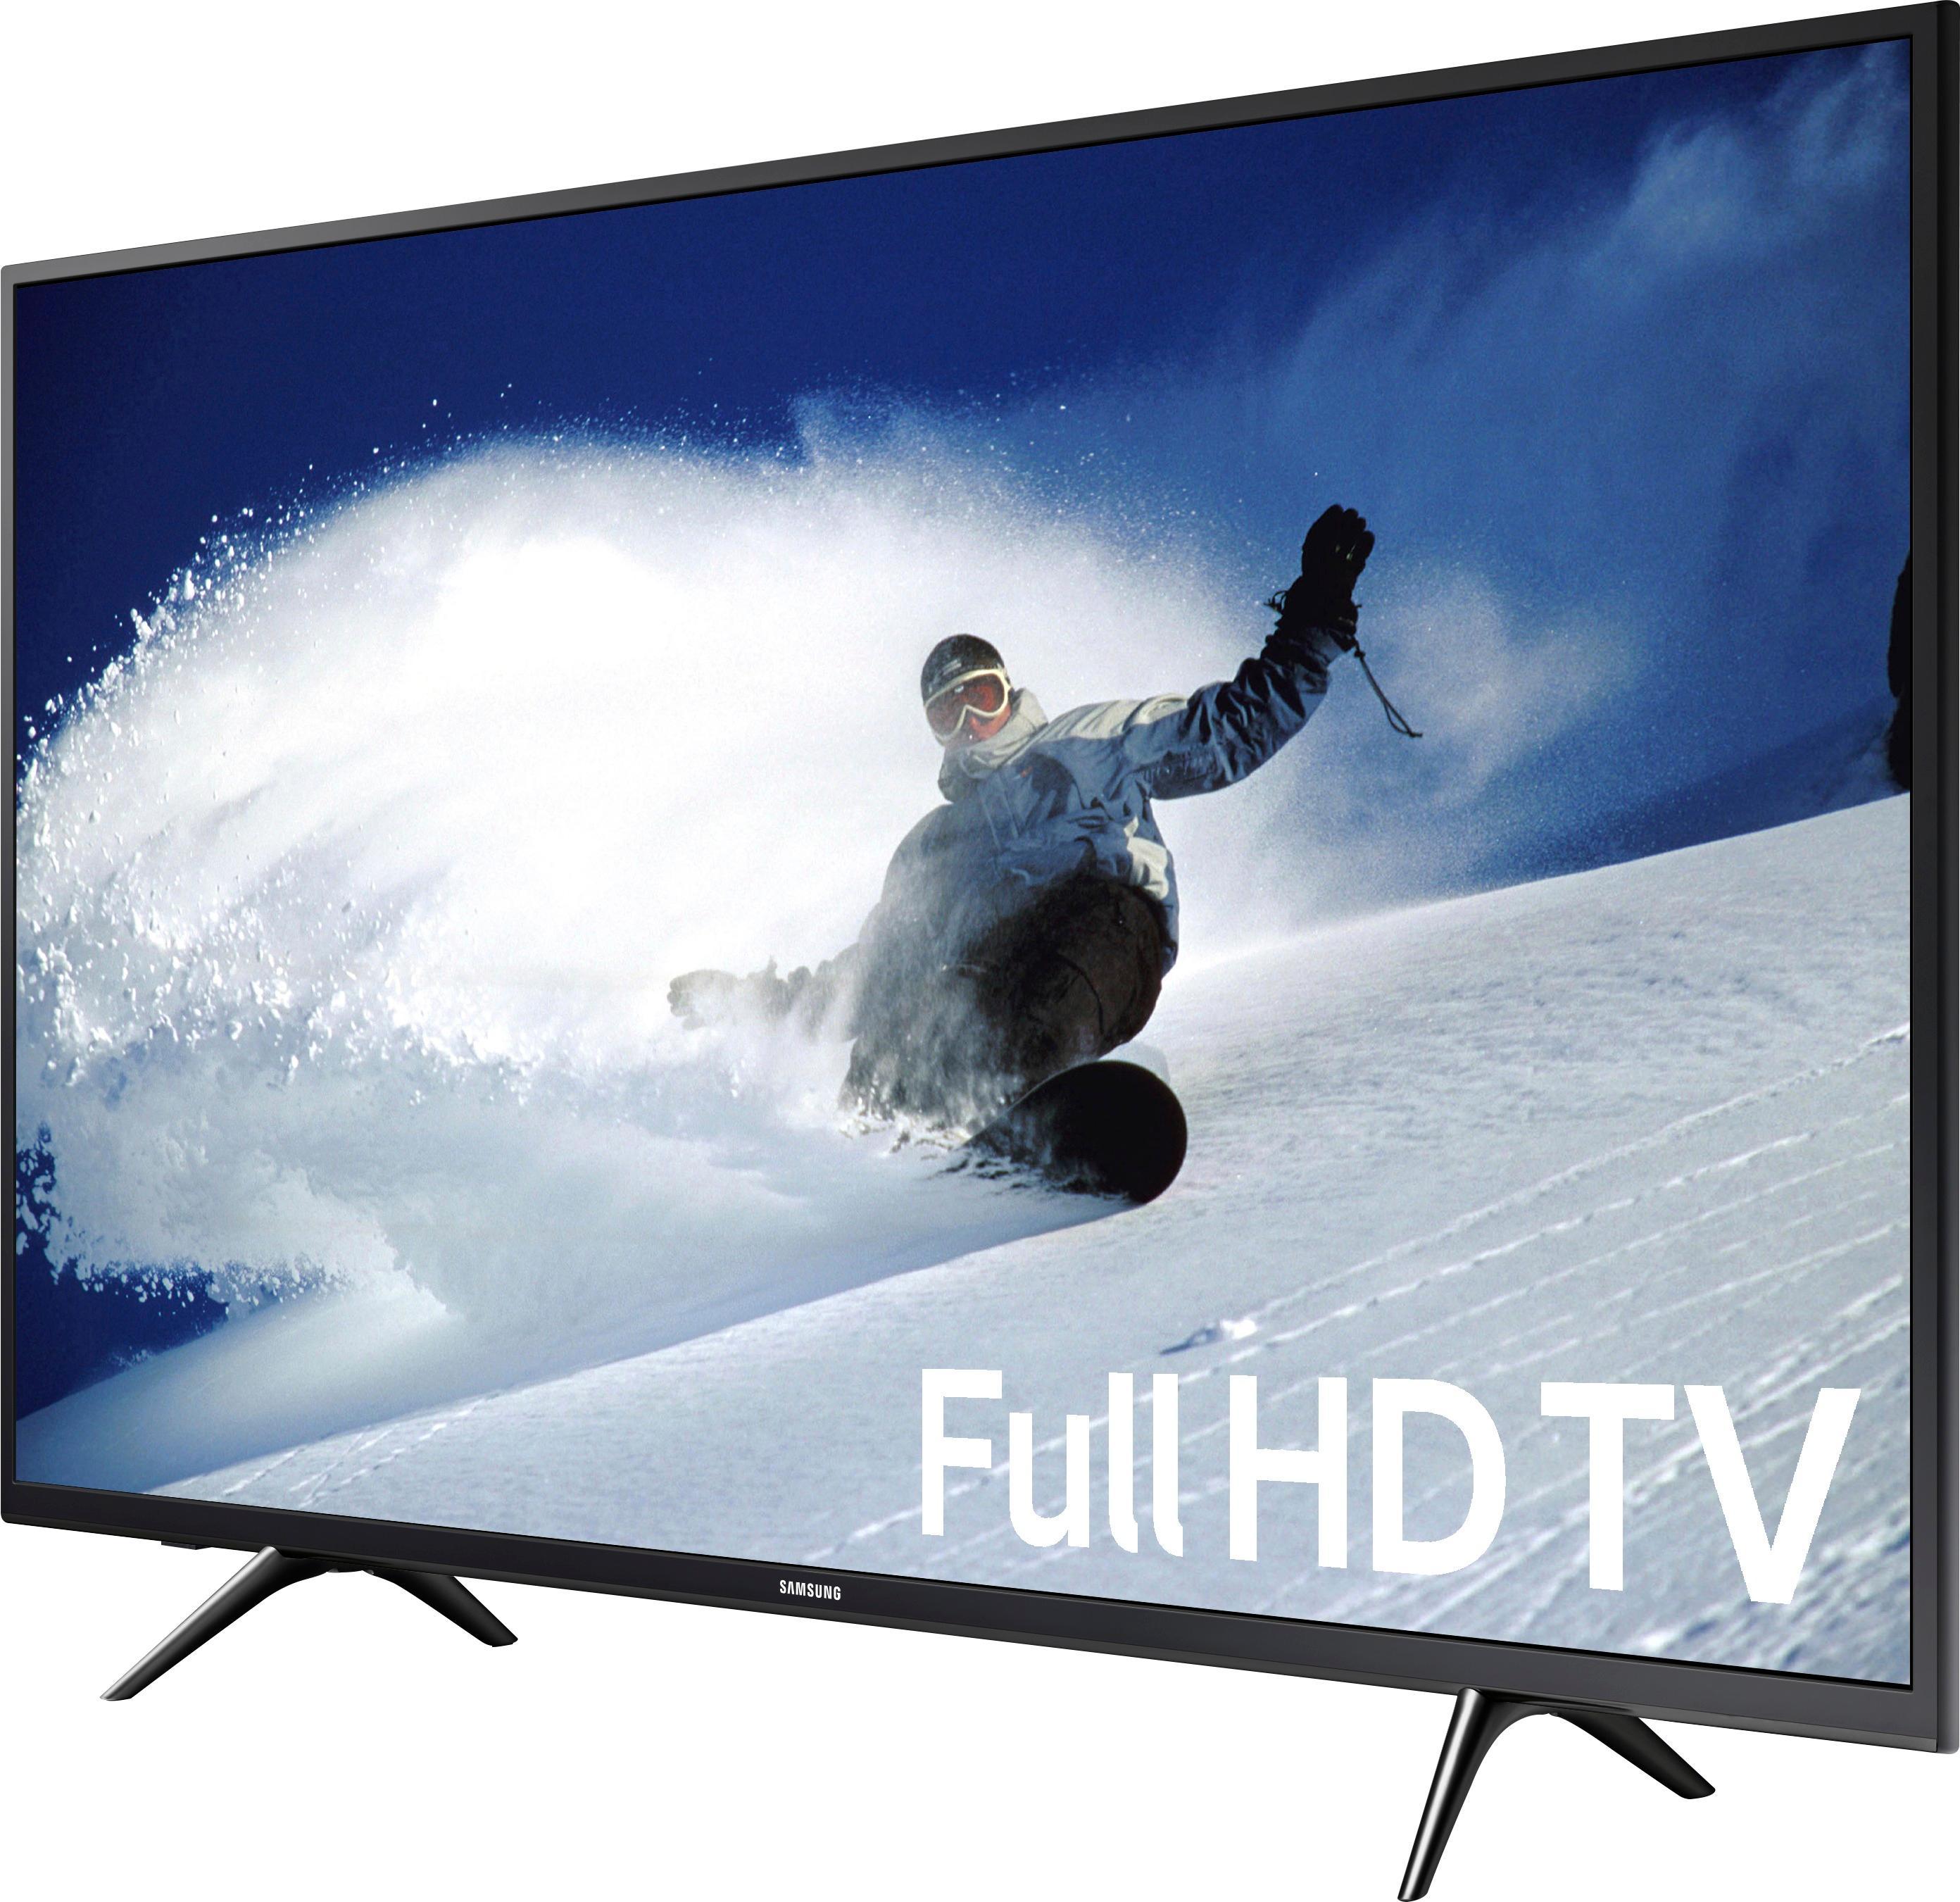 "Samsung UN43J5202AFXZA 43"" Class (43"" Diag.) LED 1080p Smart HDTV"